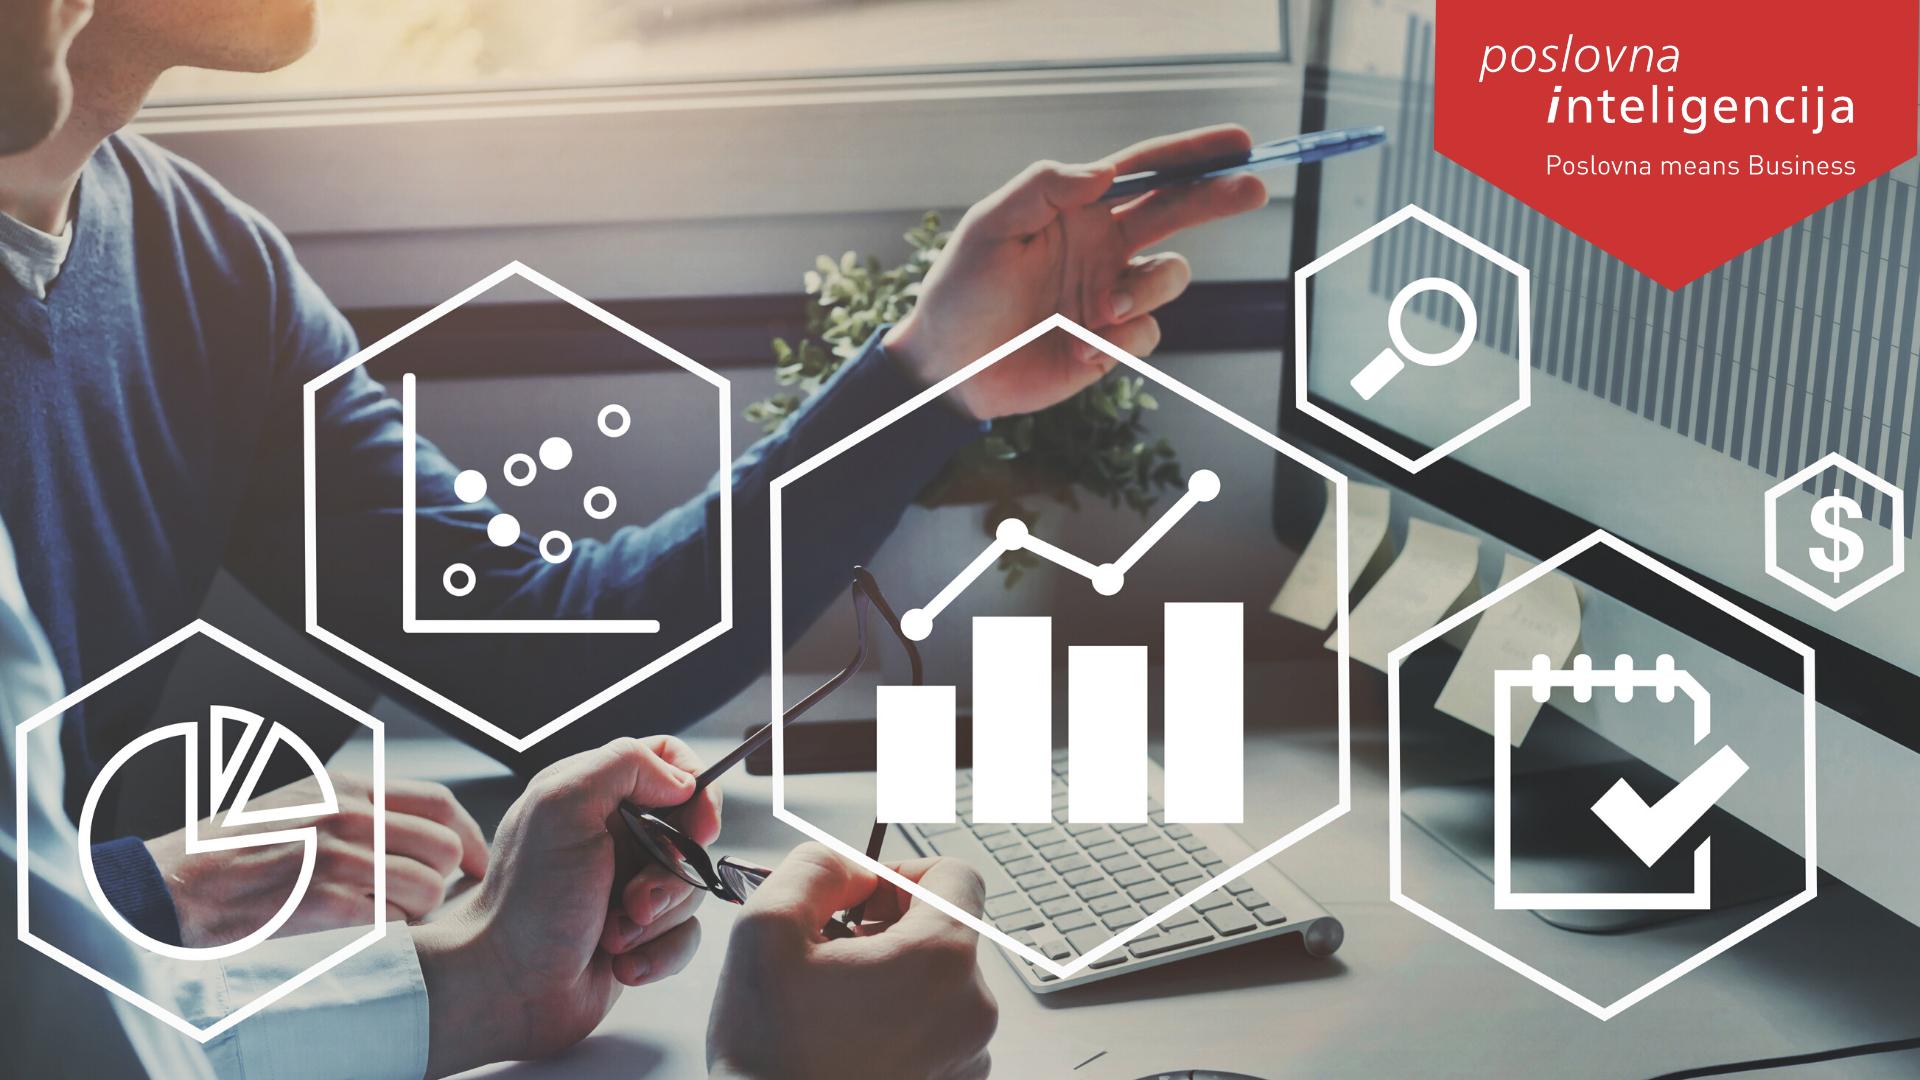 Budgeting and forecasting - Poslovna inteligencija